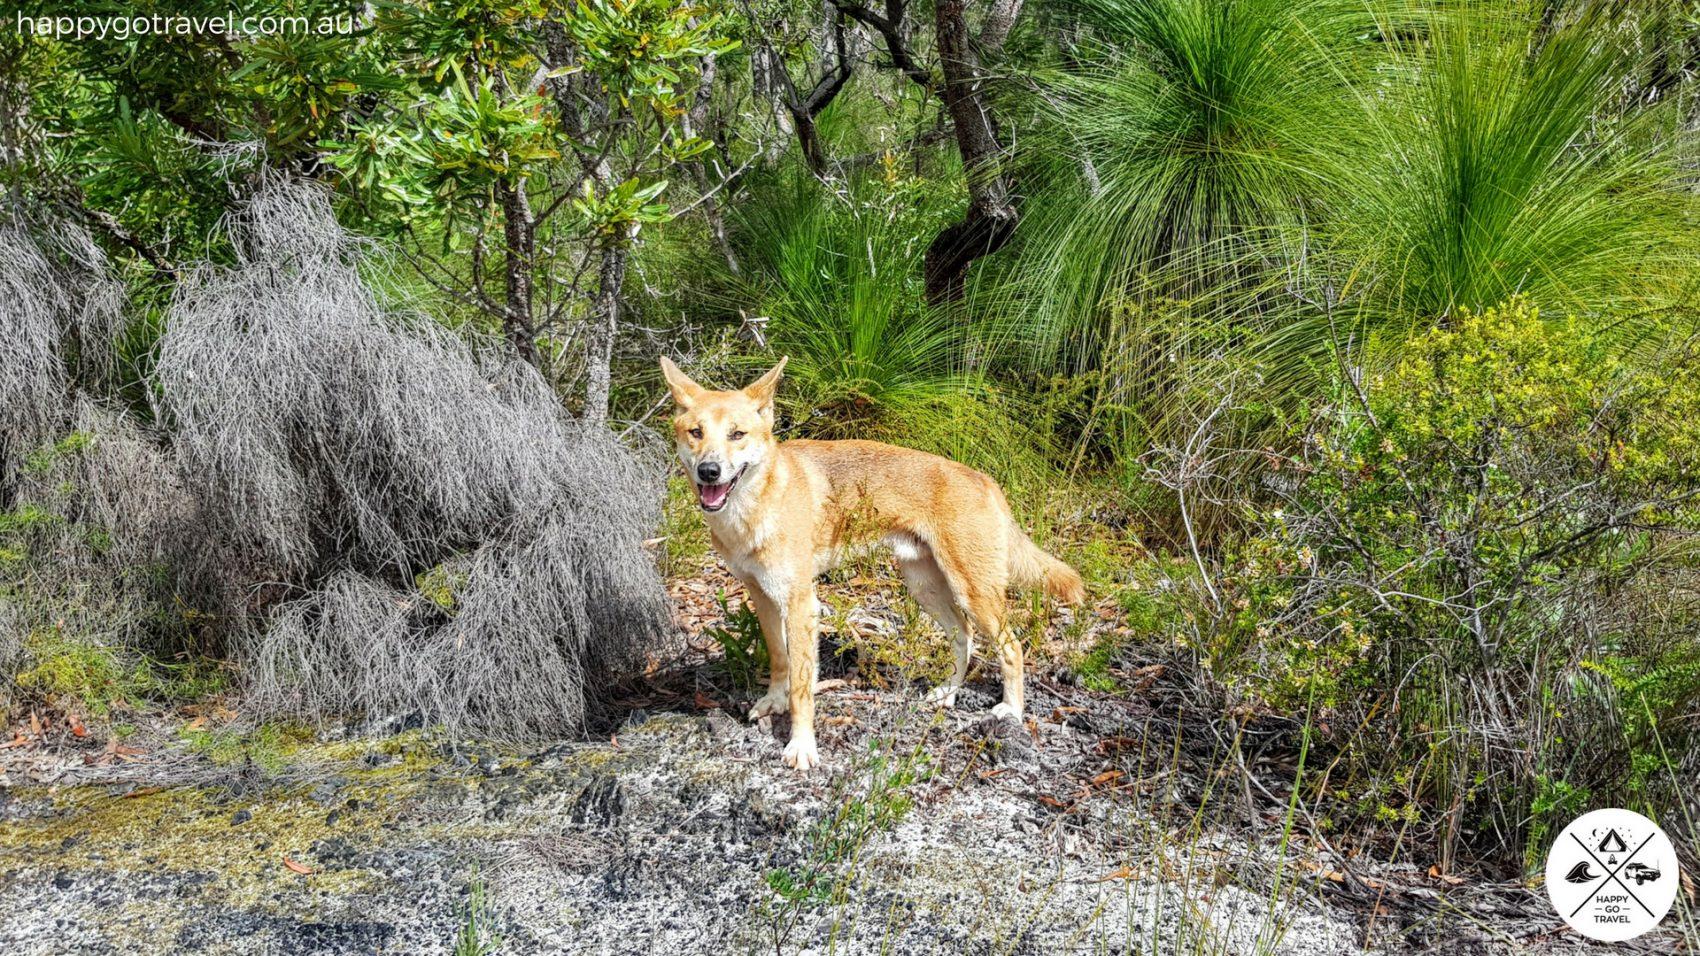 Fraser Island dingoes standing in bush